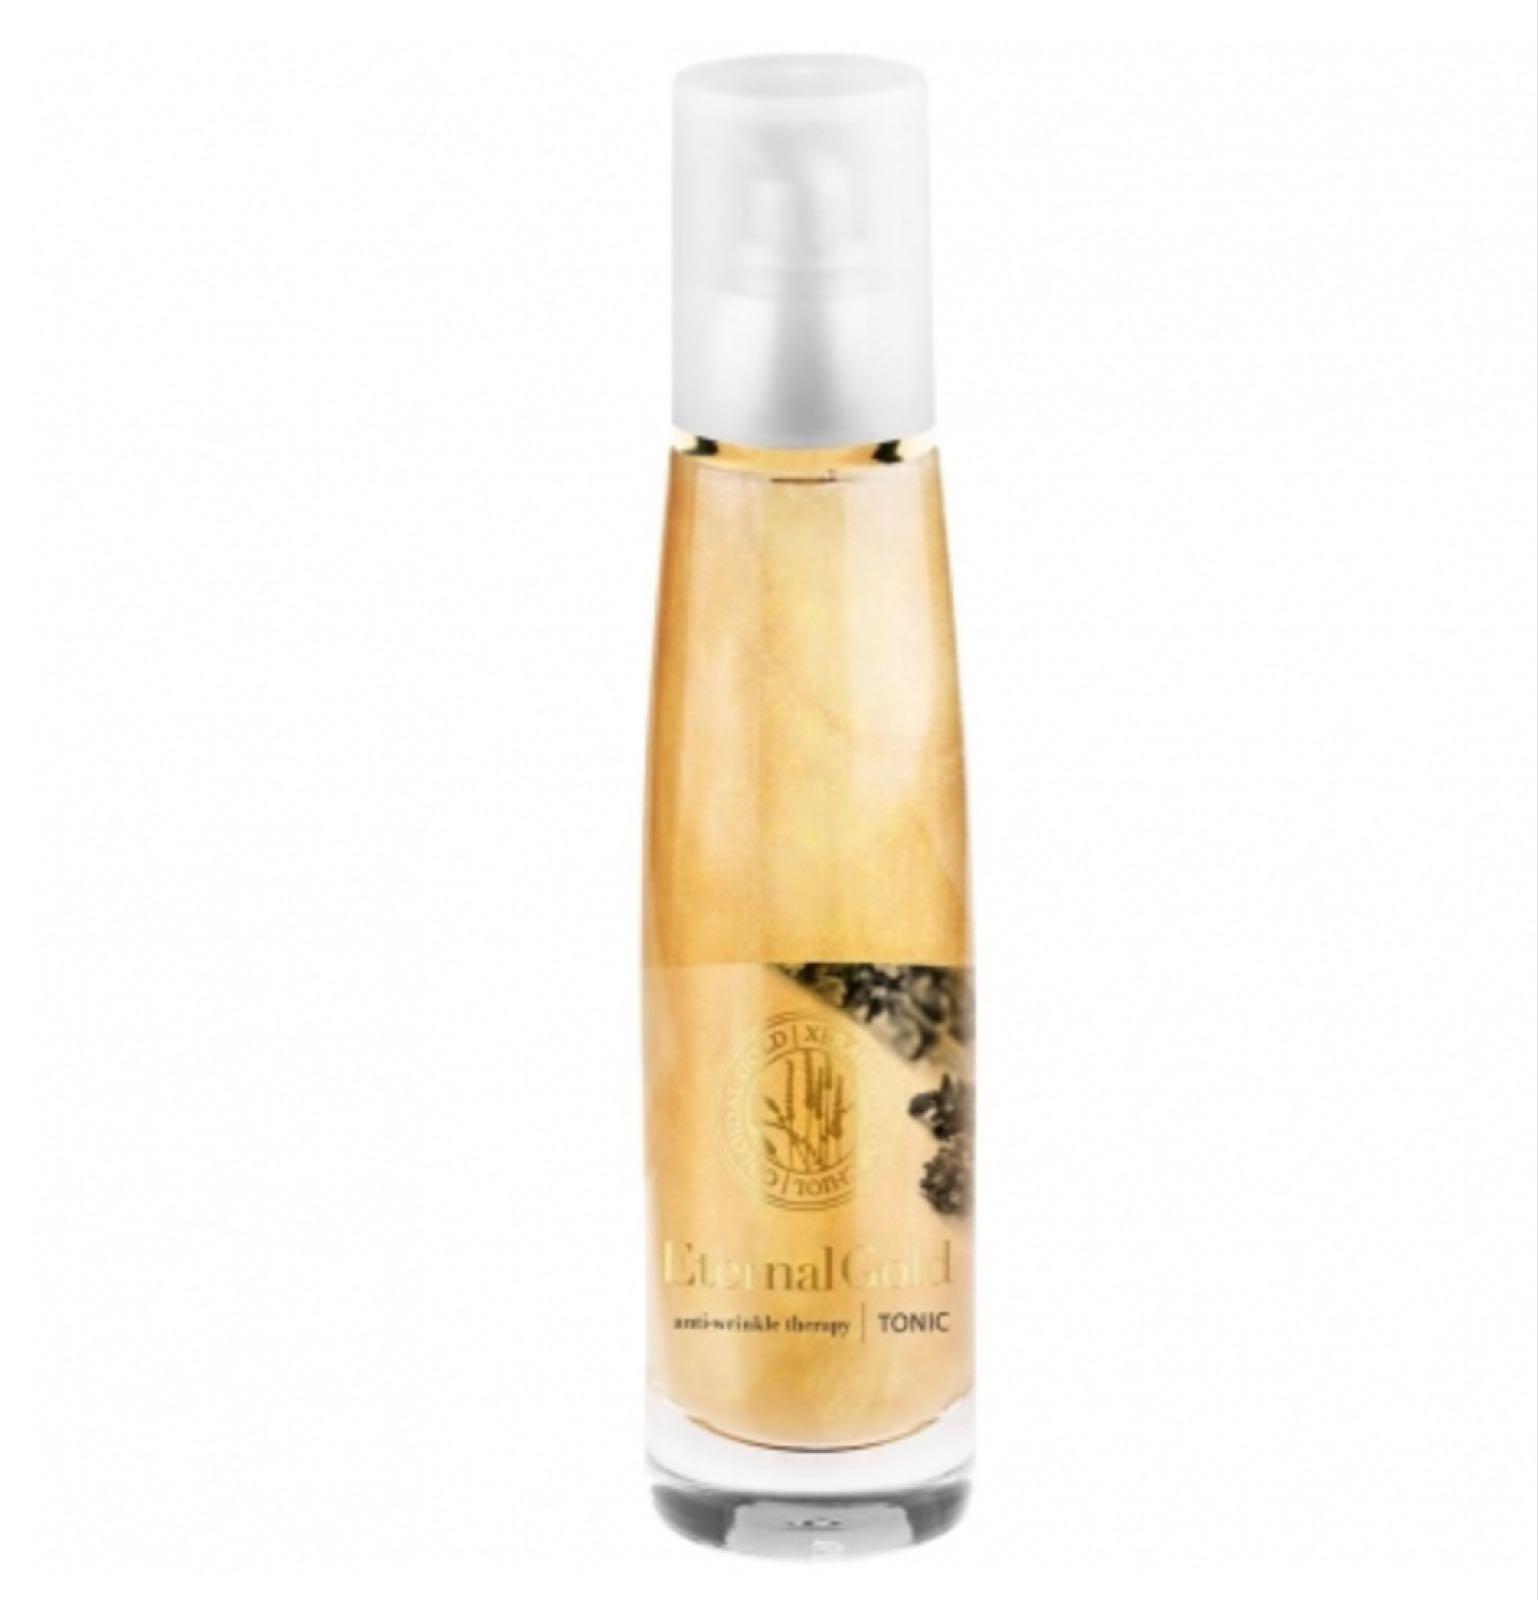 Eternal Gold Rejuvenating  Tonic 100 ml